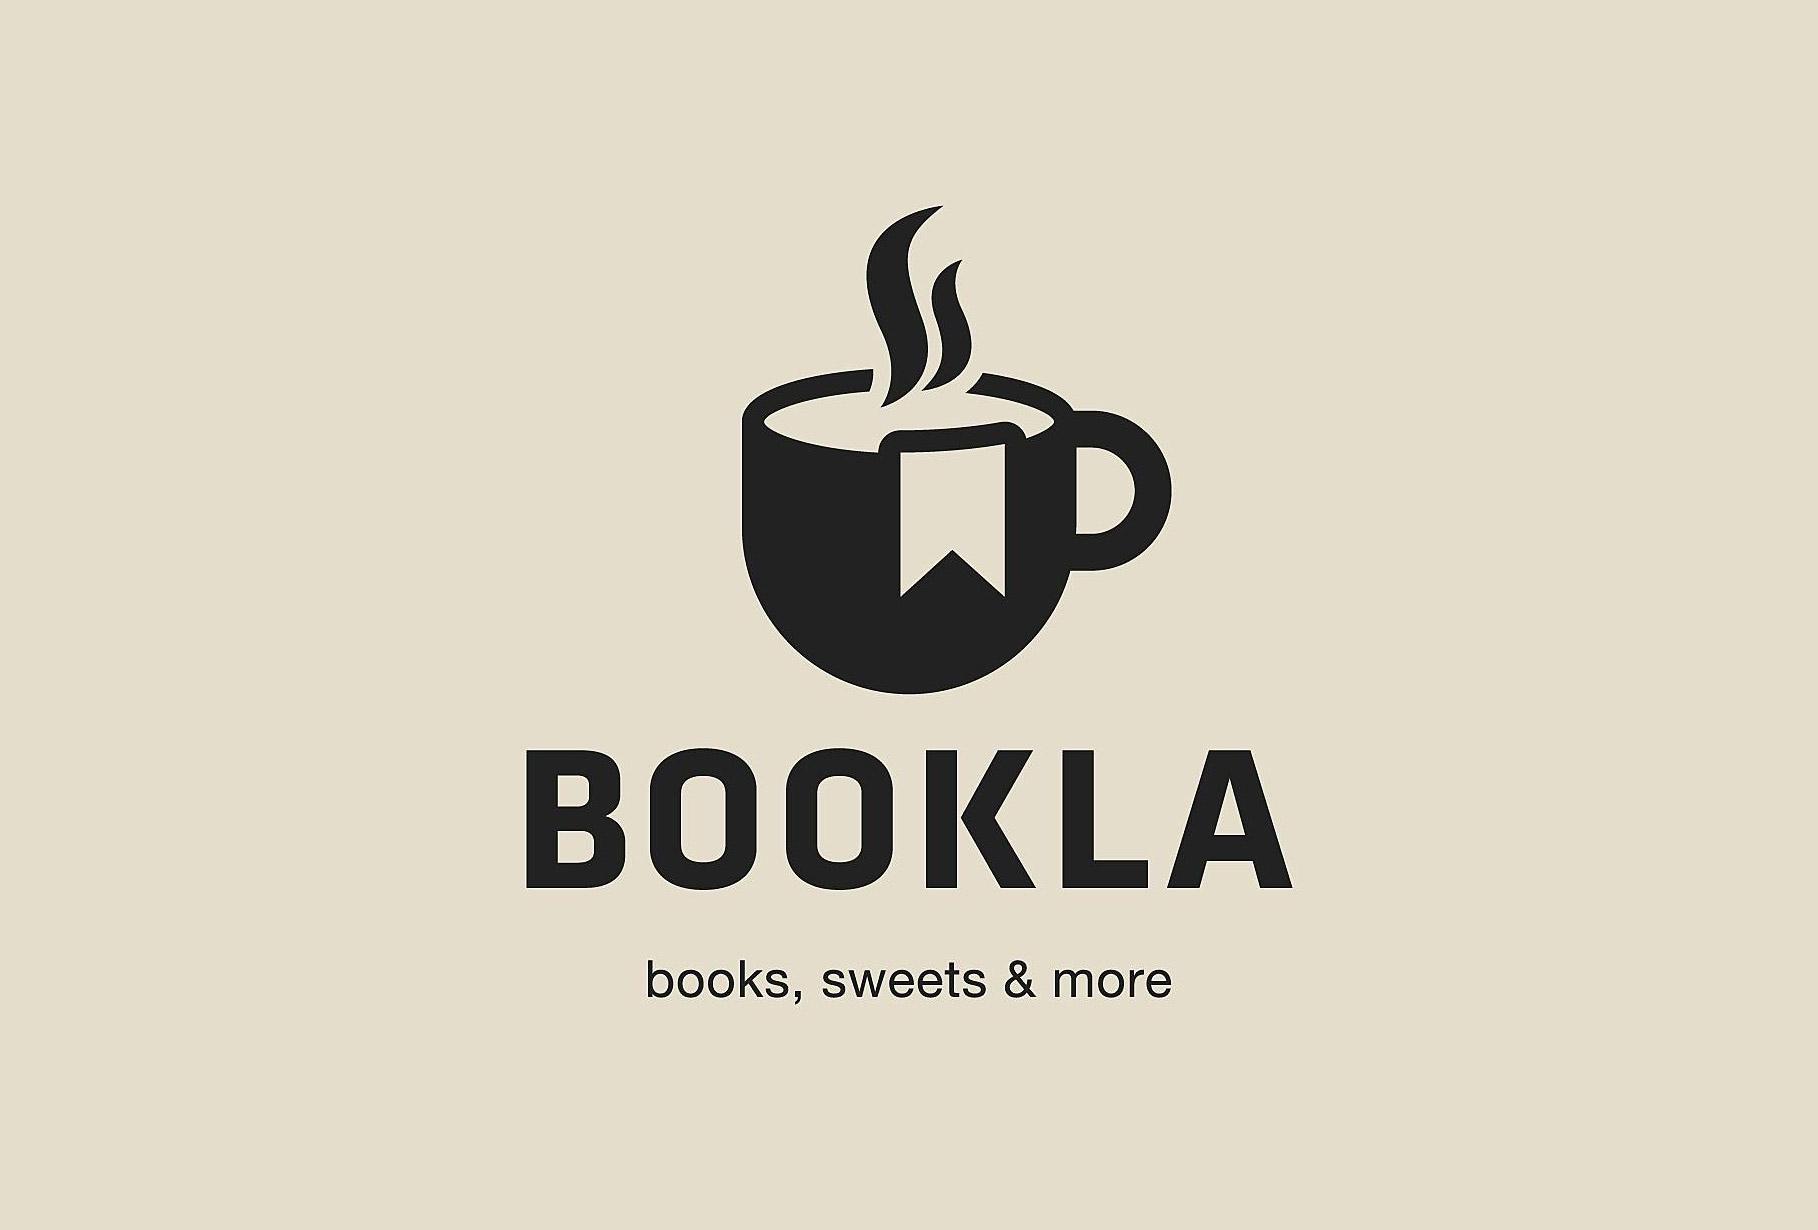 Bookla Cafe